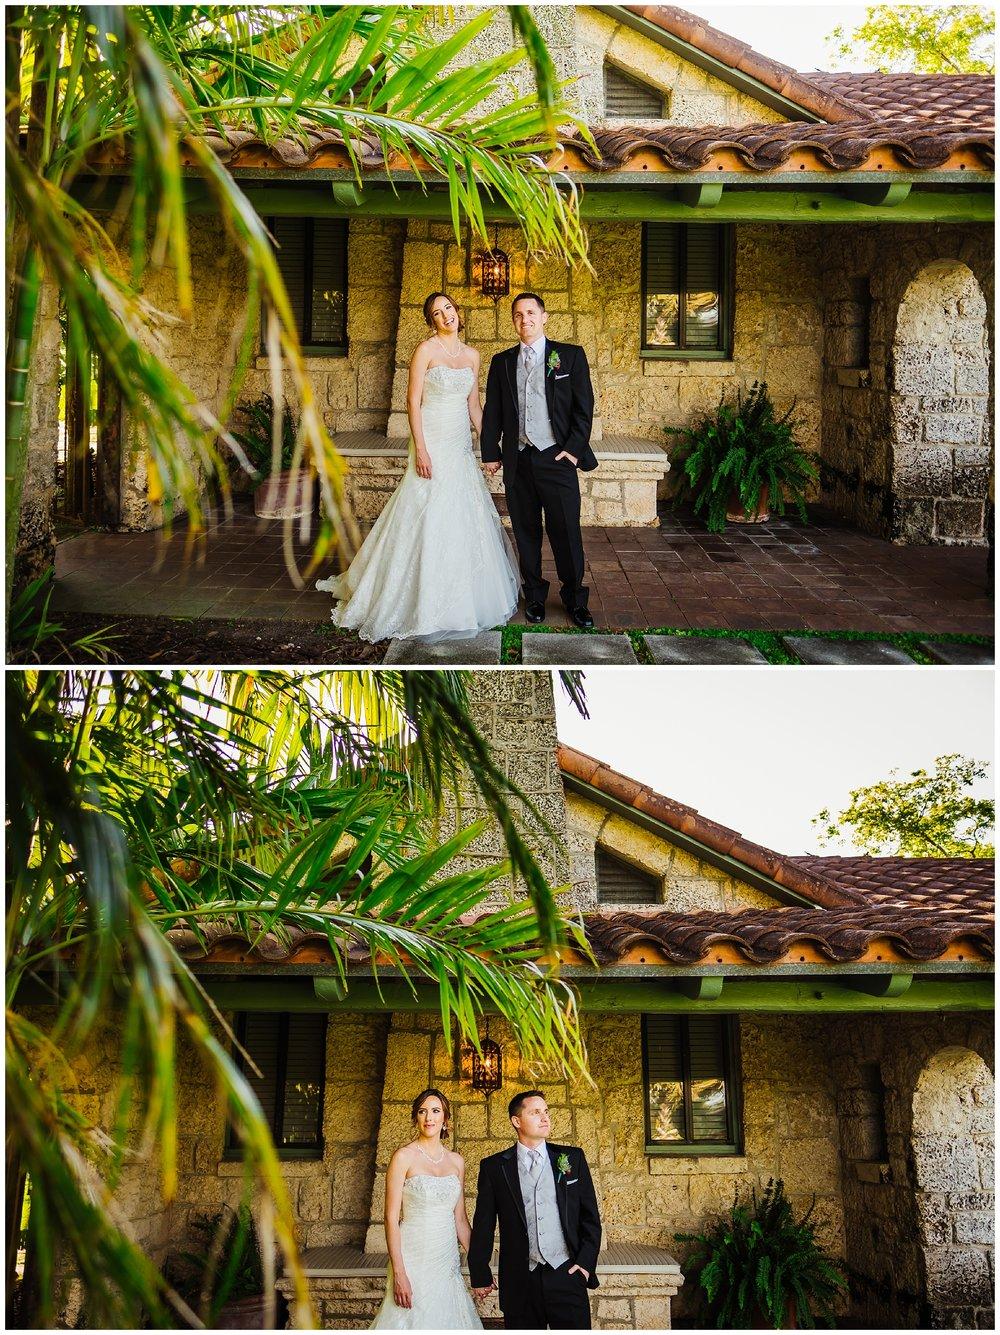 florida-destination-wedding-photographer-enchanted-tropical-miami-homestead-cooper-estate-teal_0031.jpg